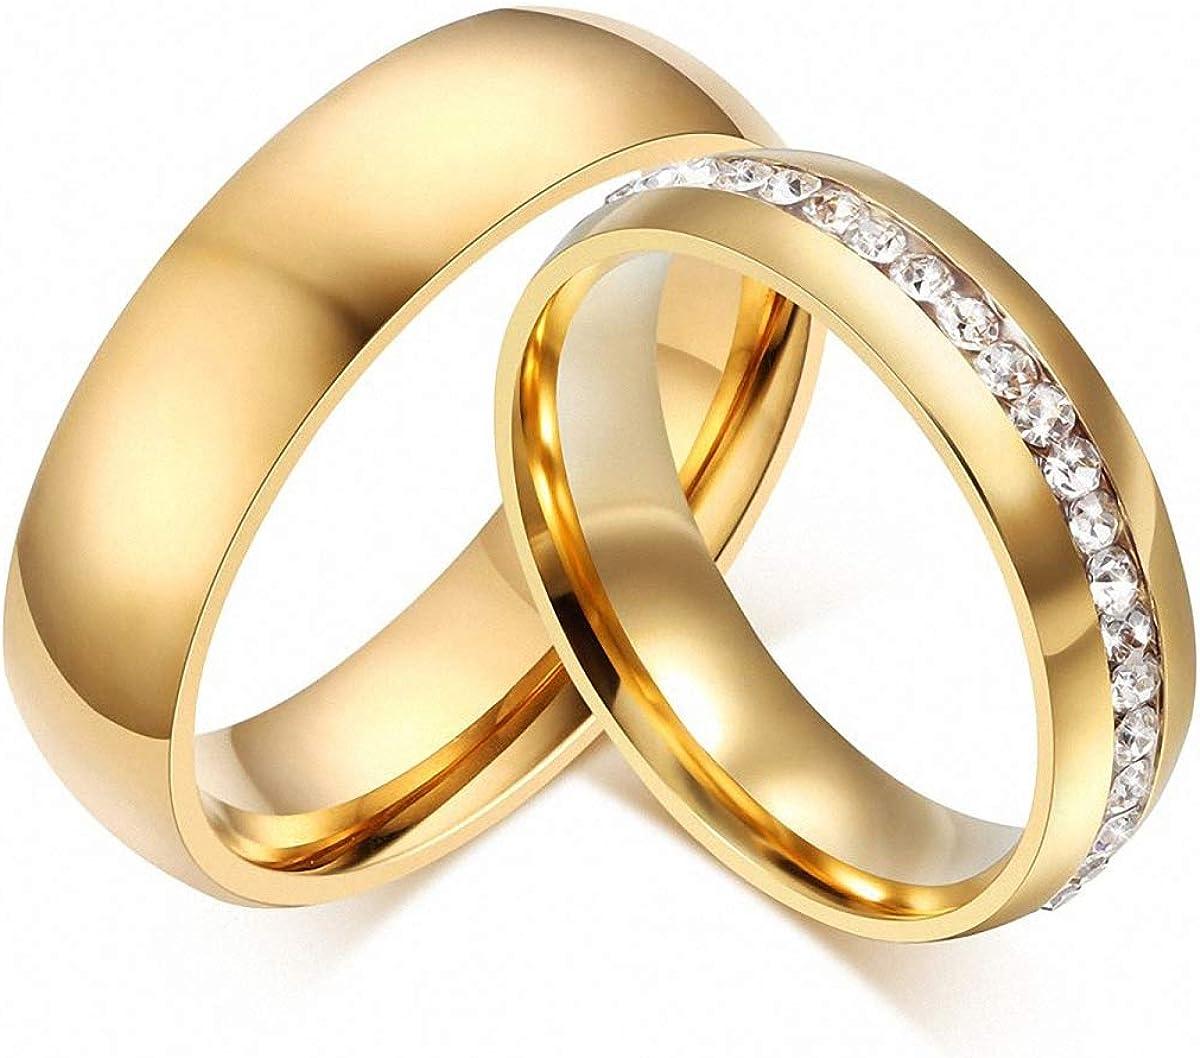 Amazon Com Gold Ring Women Men 6mm Stainless Steel Engagement Ring Cz Stone Couple Wedding Ring Women 13 Clothing